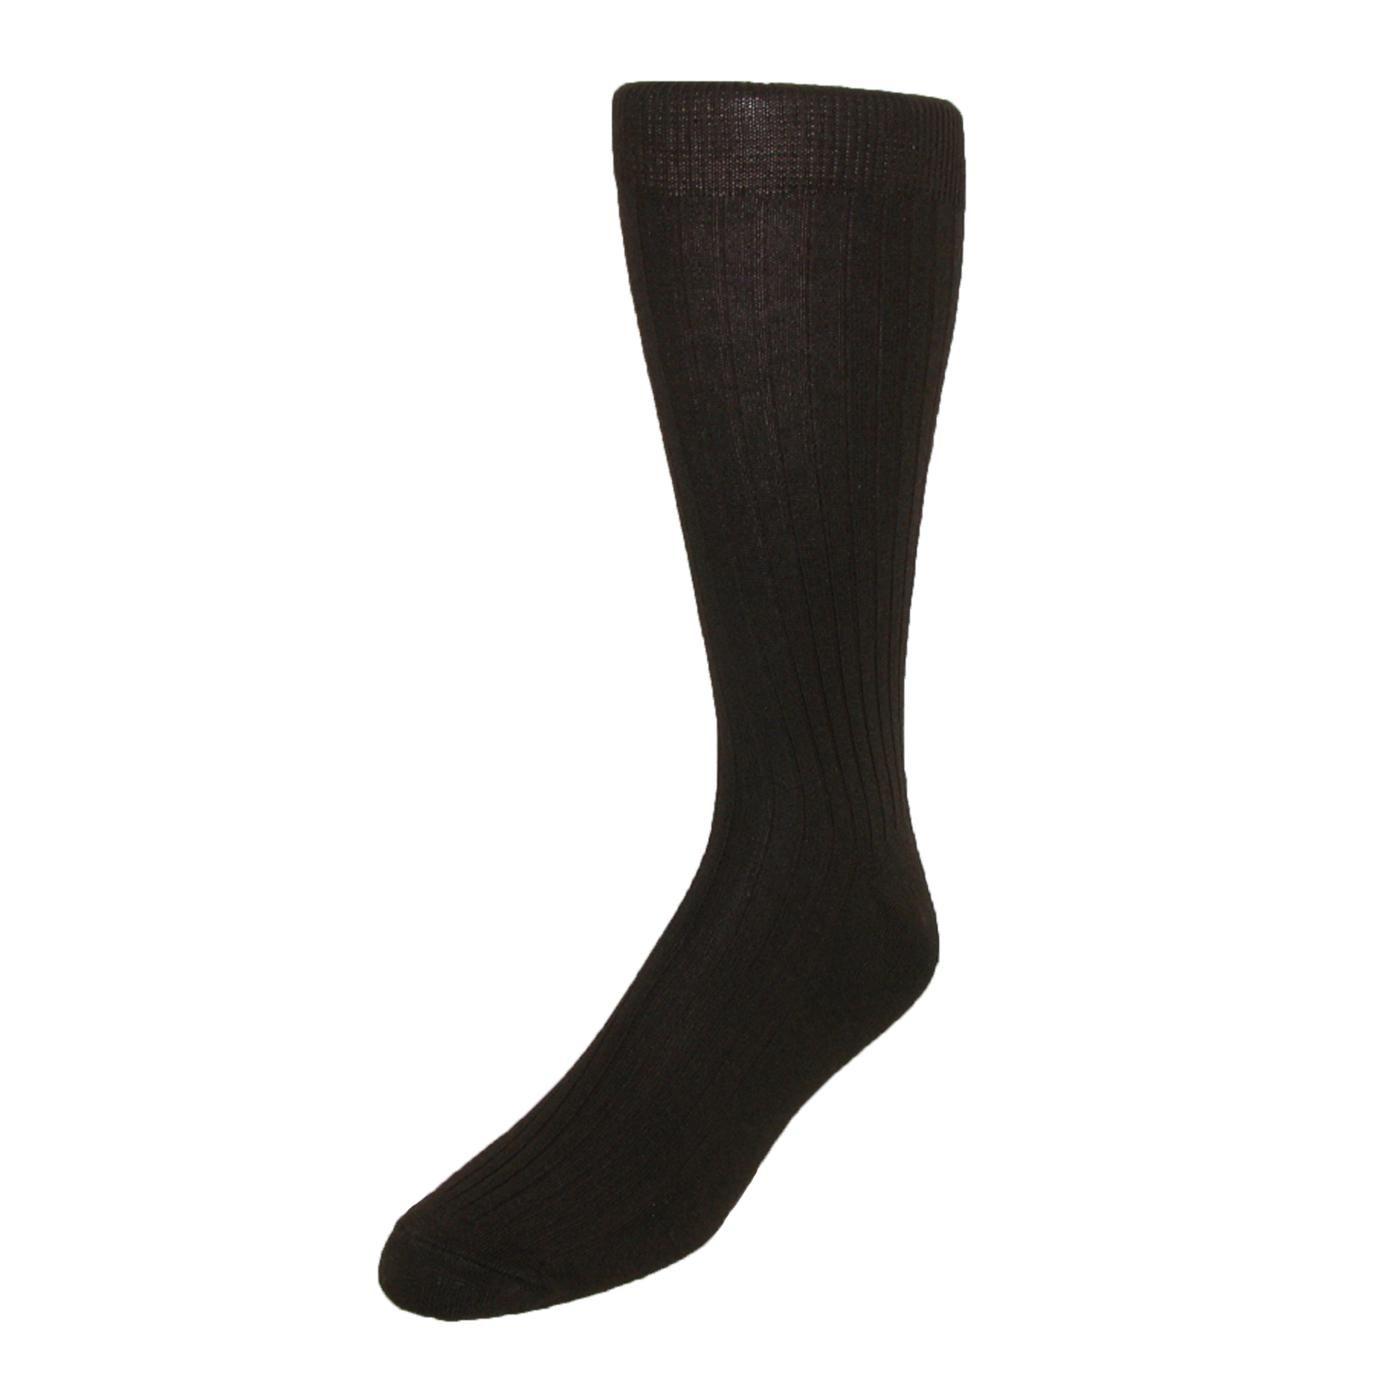 Jefferies Socks Mens Cotton Uniform Dress Sock Dress Socks Jefferies Socks Socks And Hosiery [ 1400 x 1400 Pixel ]